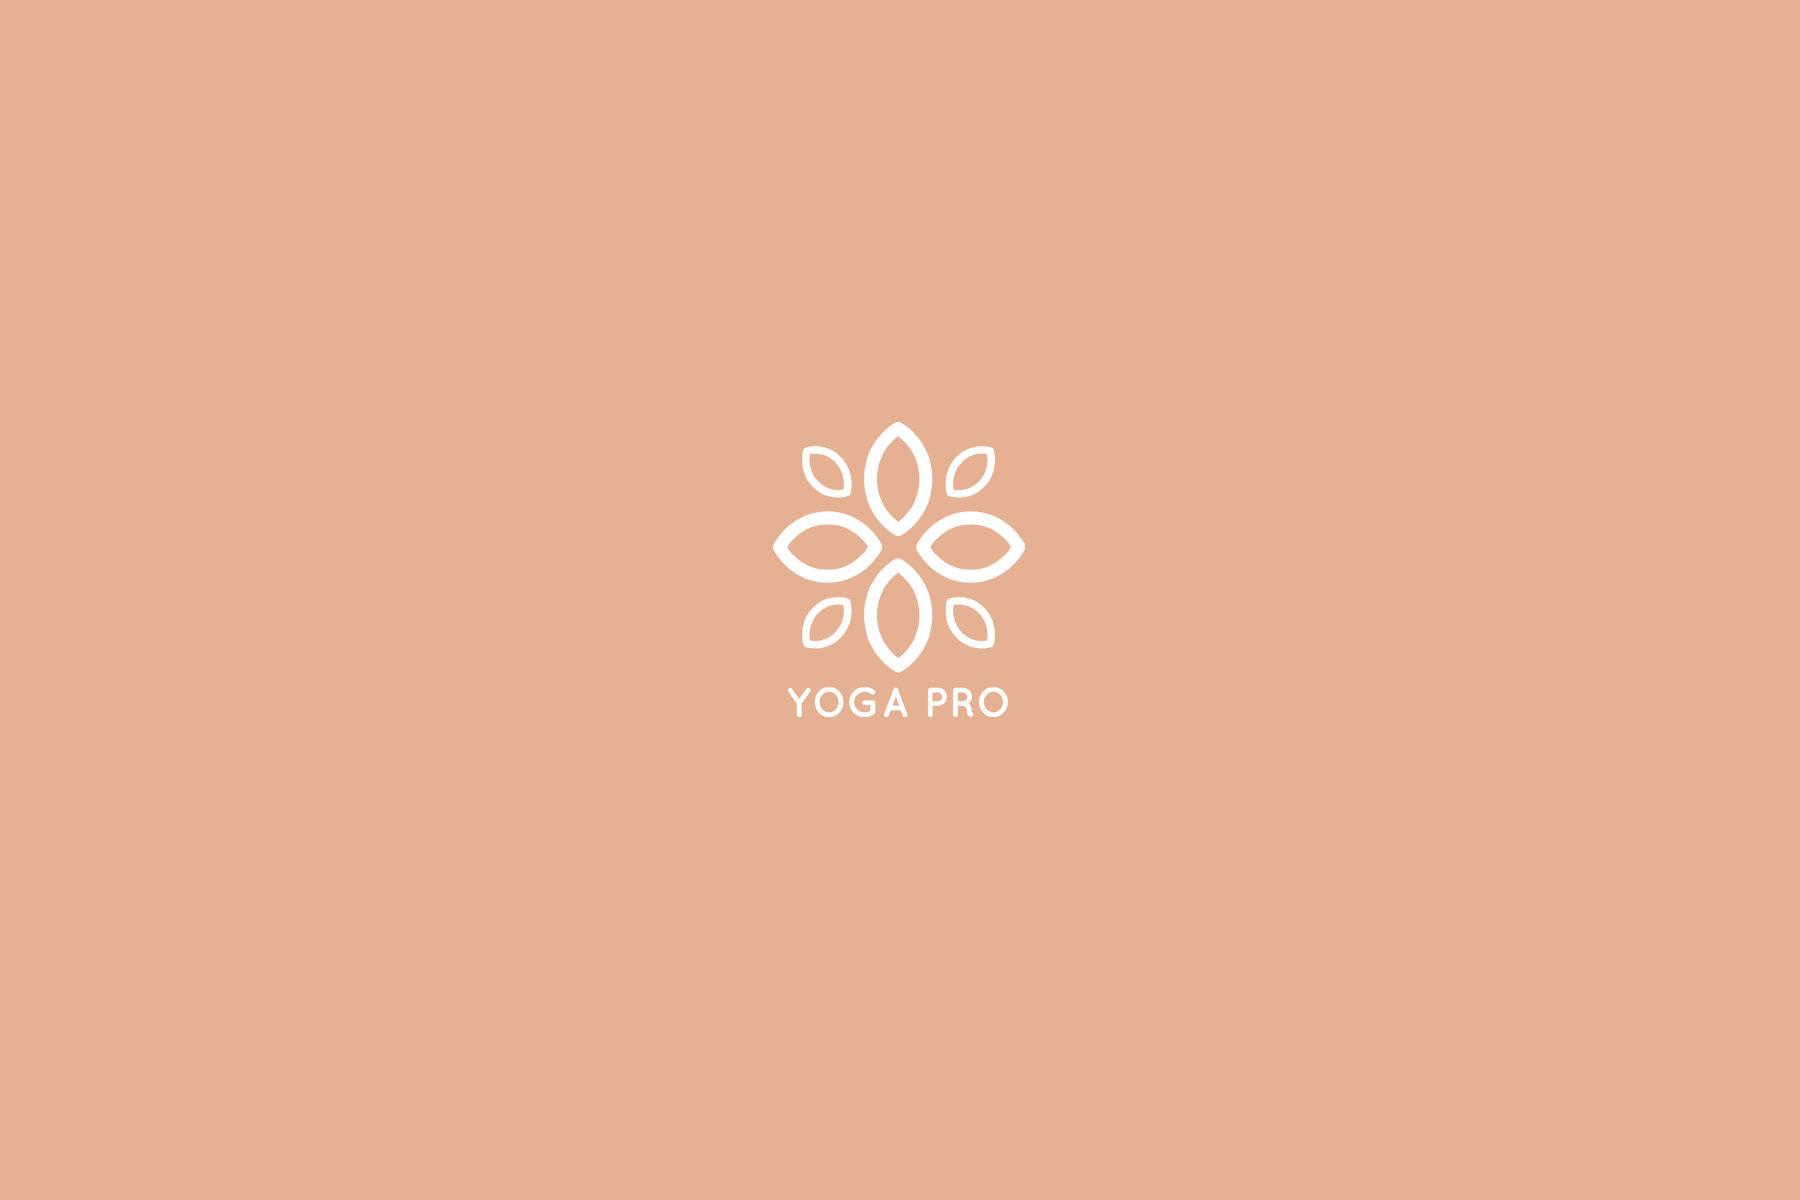 yoga-pro-portfolio-logo.jpg